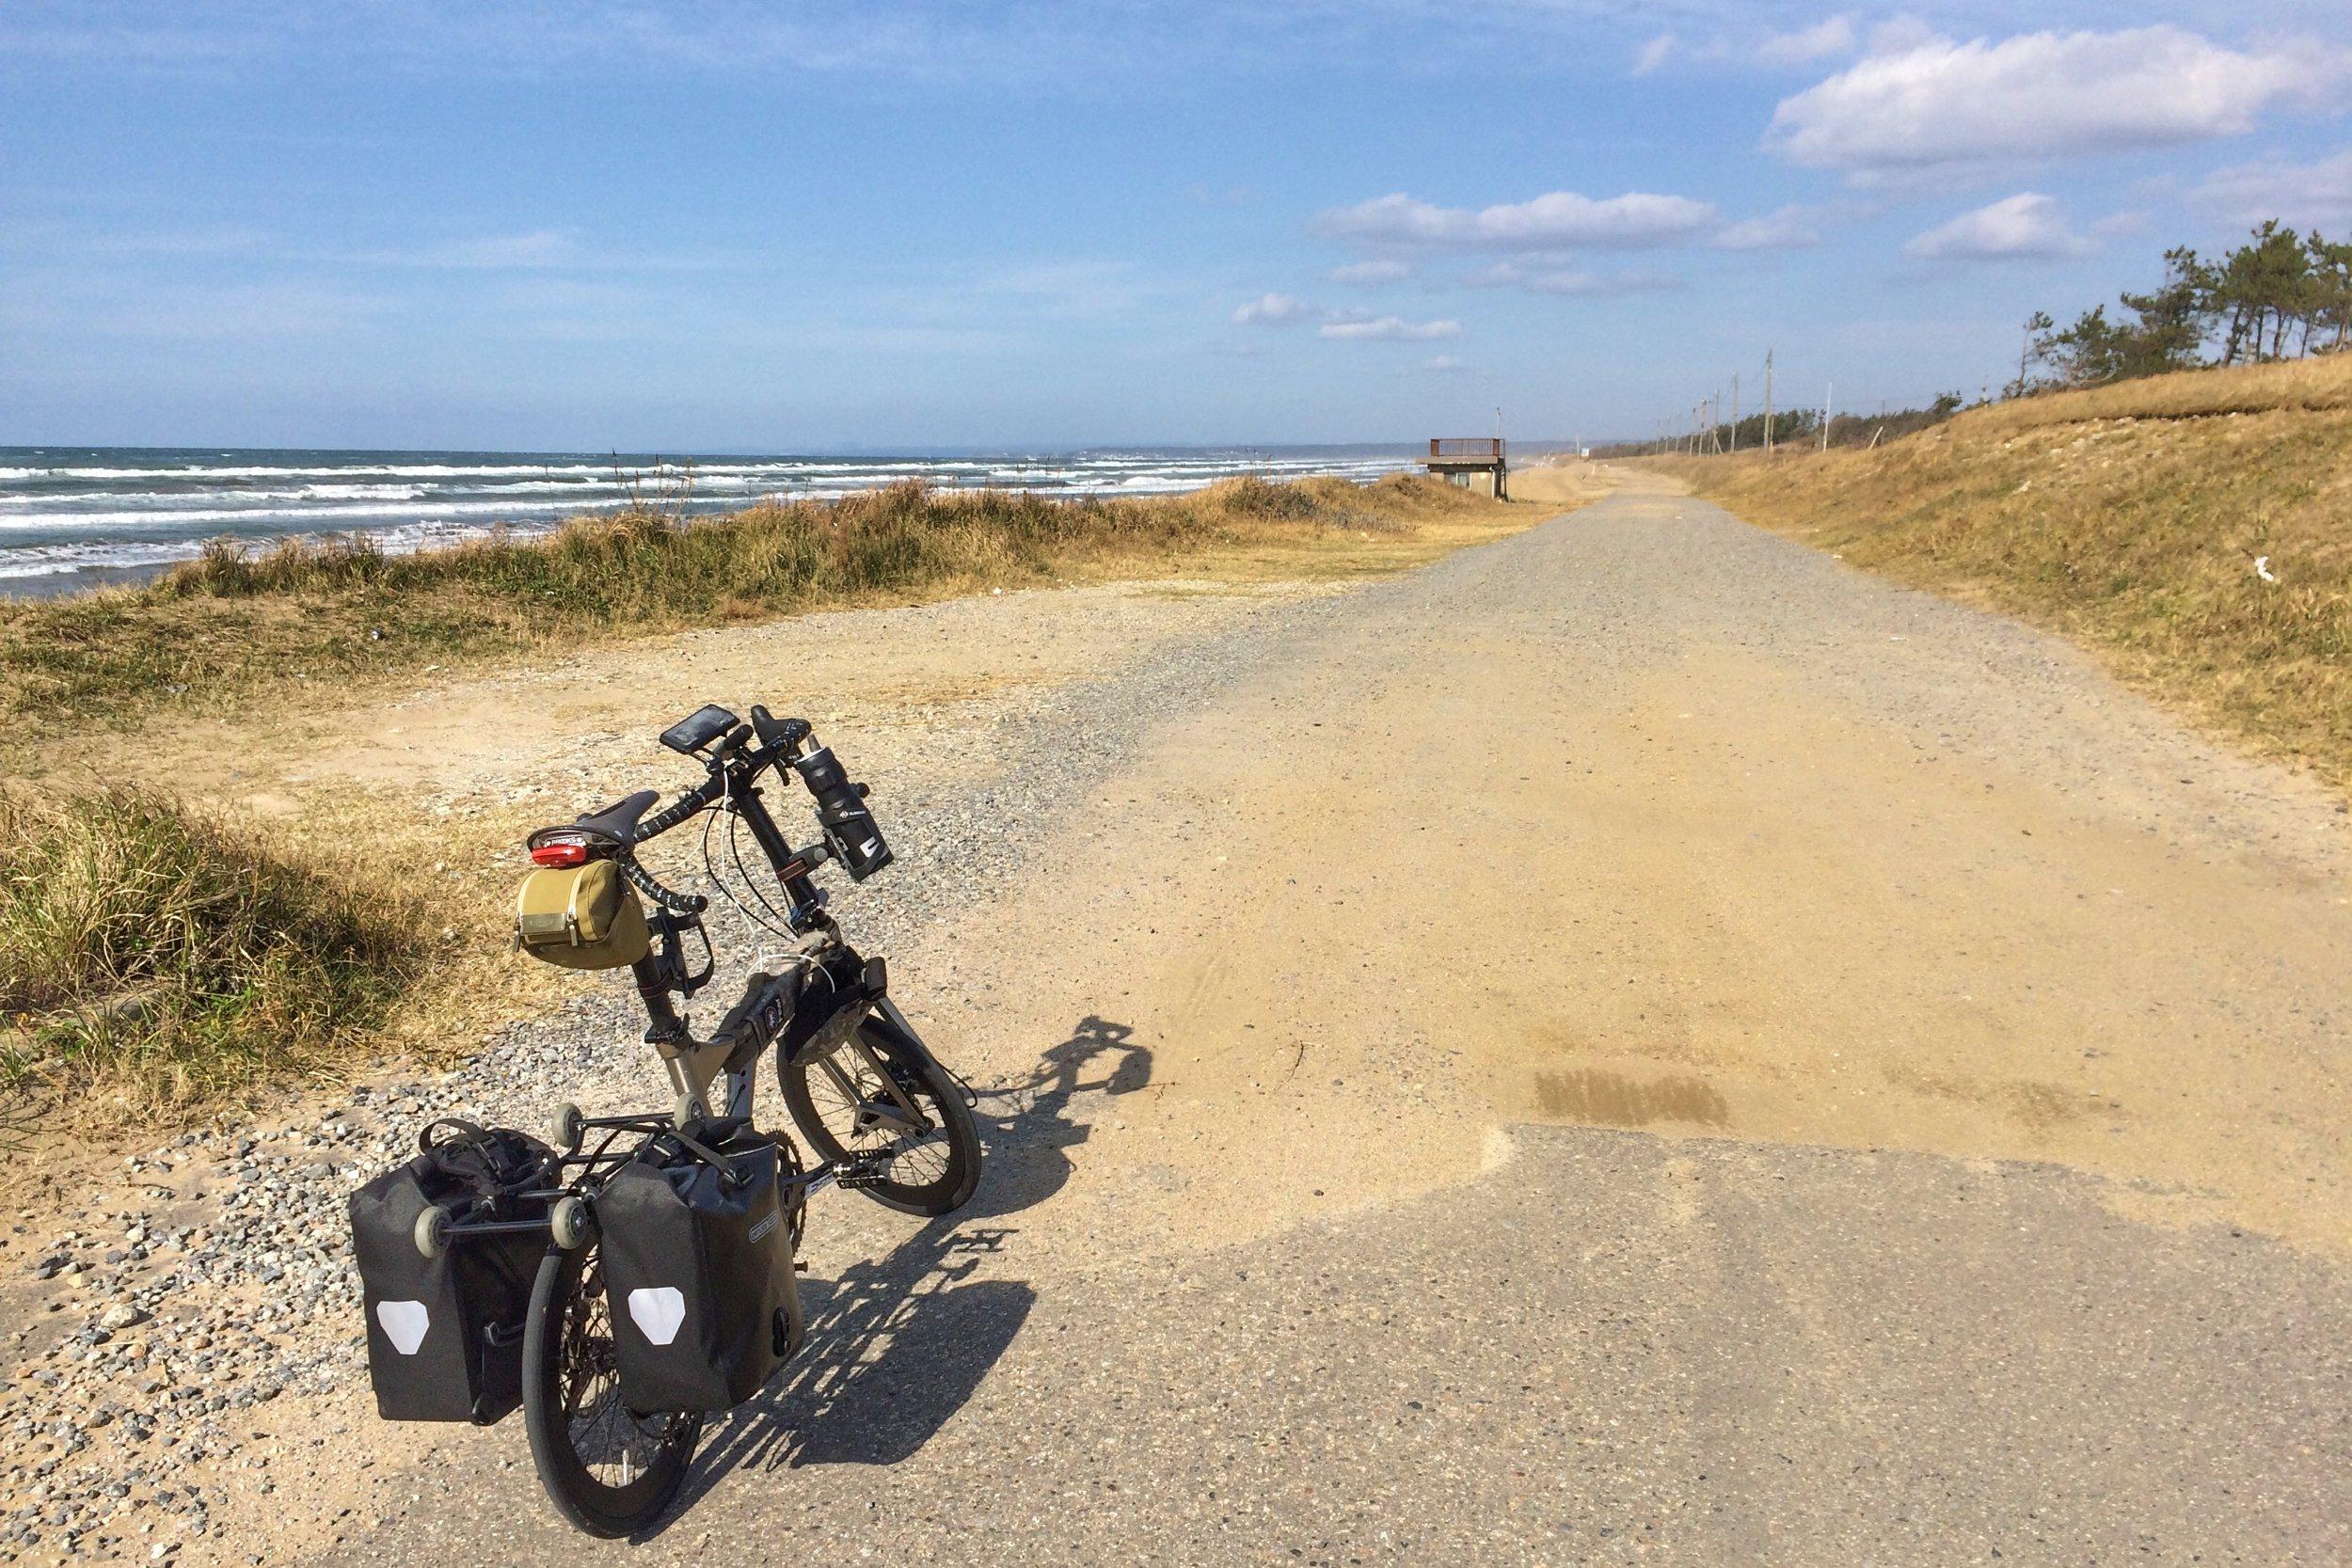 The beginning of our cycling road tour along Chirihama, Ishikawa Prefecture, Japan.